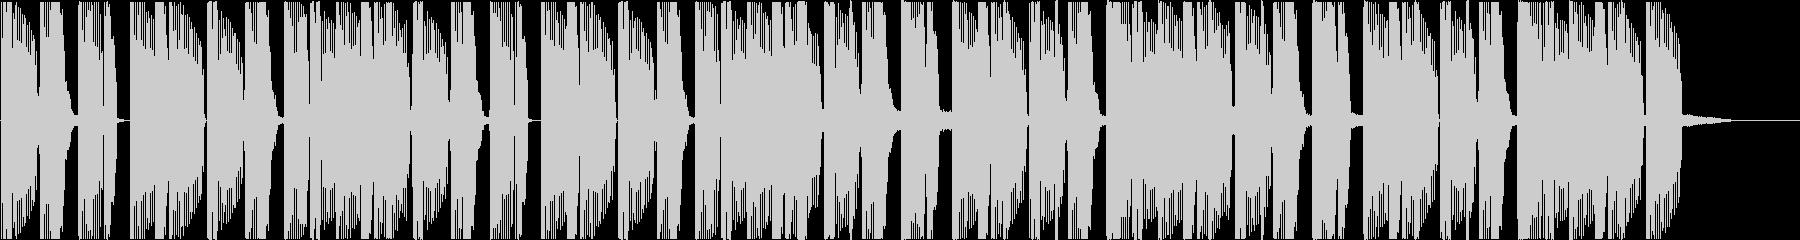 Deep bass-based electro jingle's unreproduced waveform